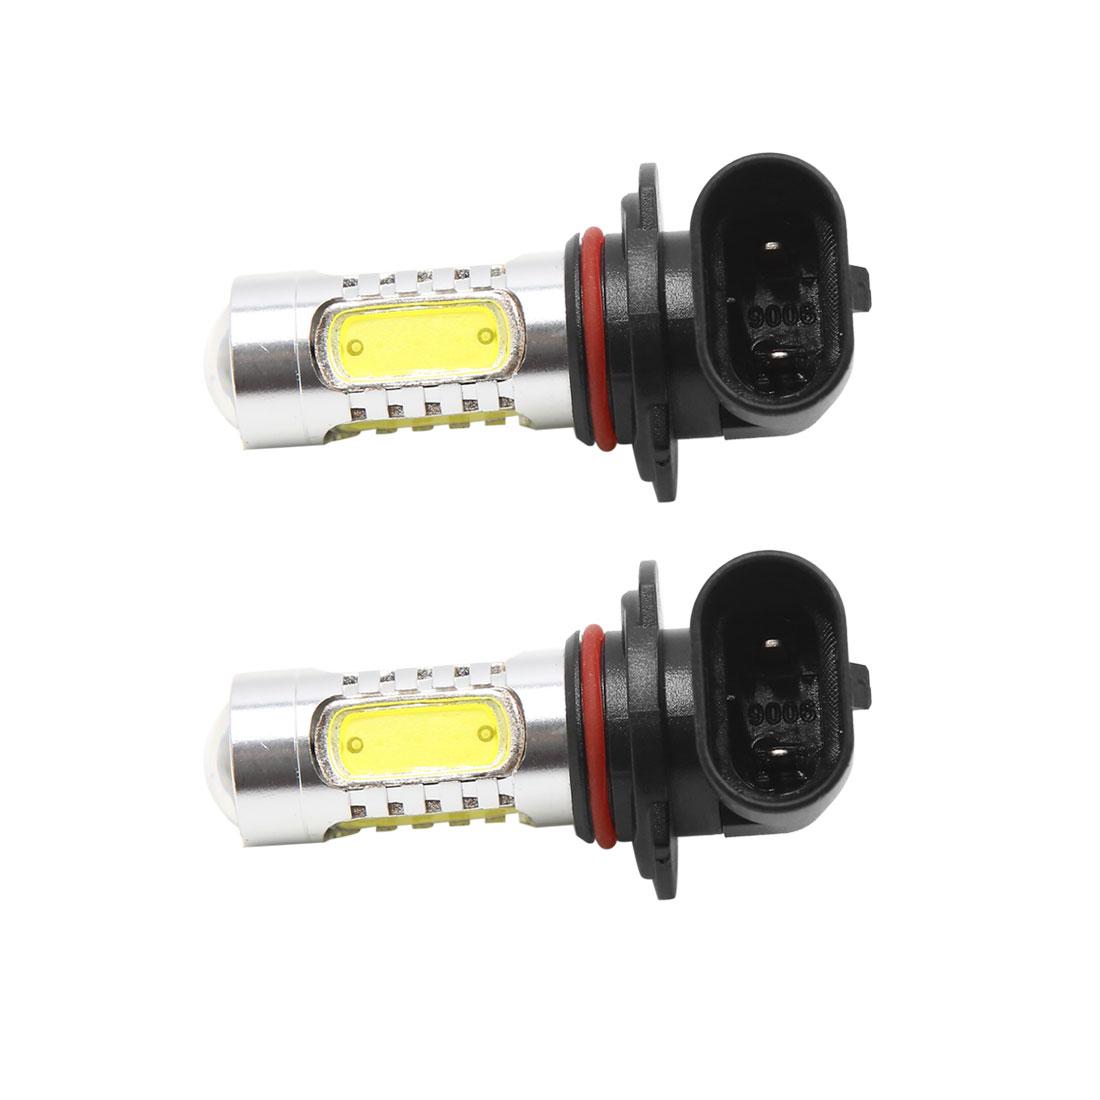 2pcs 12V 7.5W 9006 5 White LED DRL Headlamp Fog Light Bulb for Car Automobile - image 2 of 2